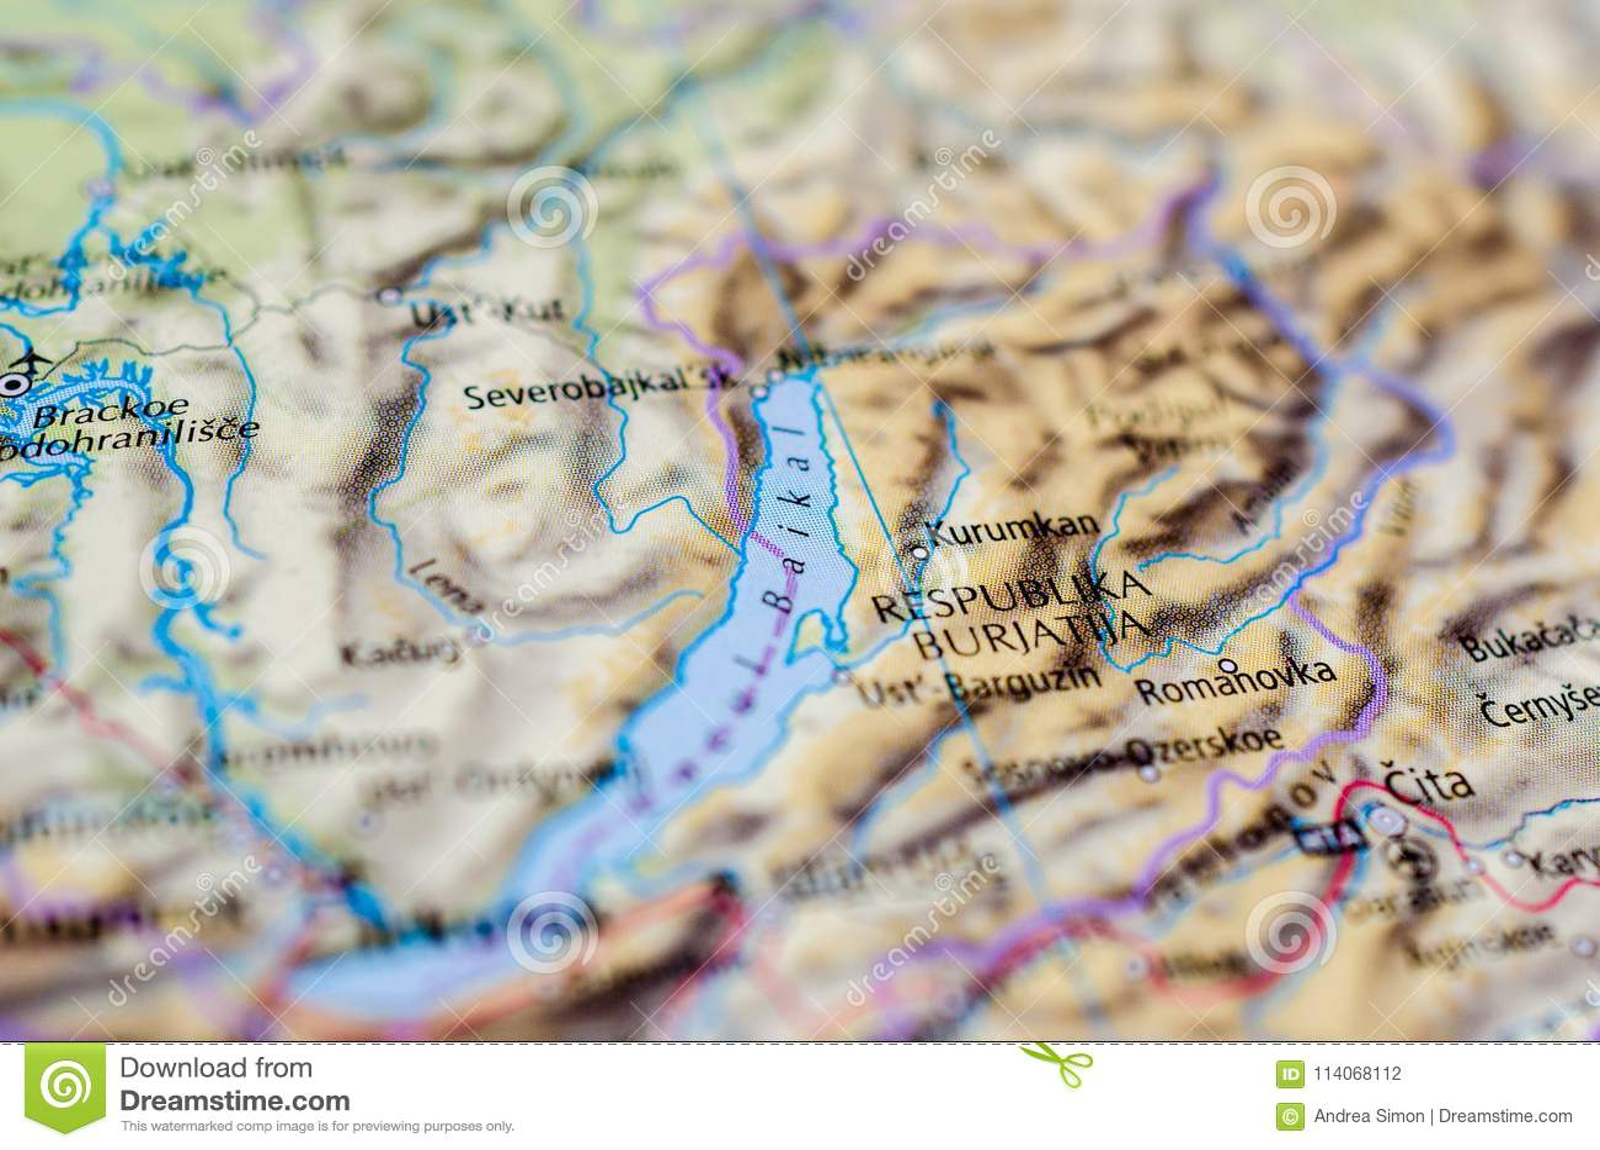 Cartina Siberia Russia.Lake Baikal On Map Stock Photo Image Of Paper Continent 114068112